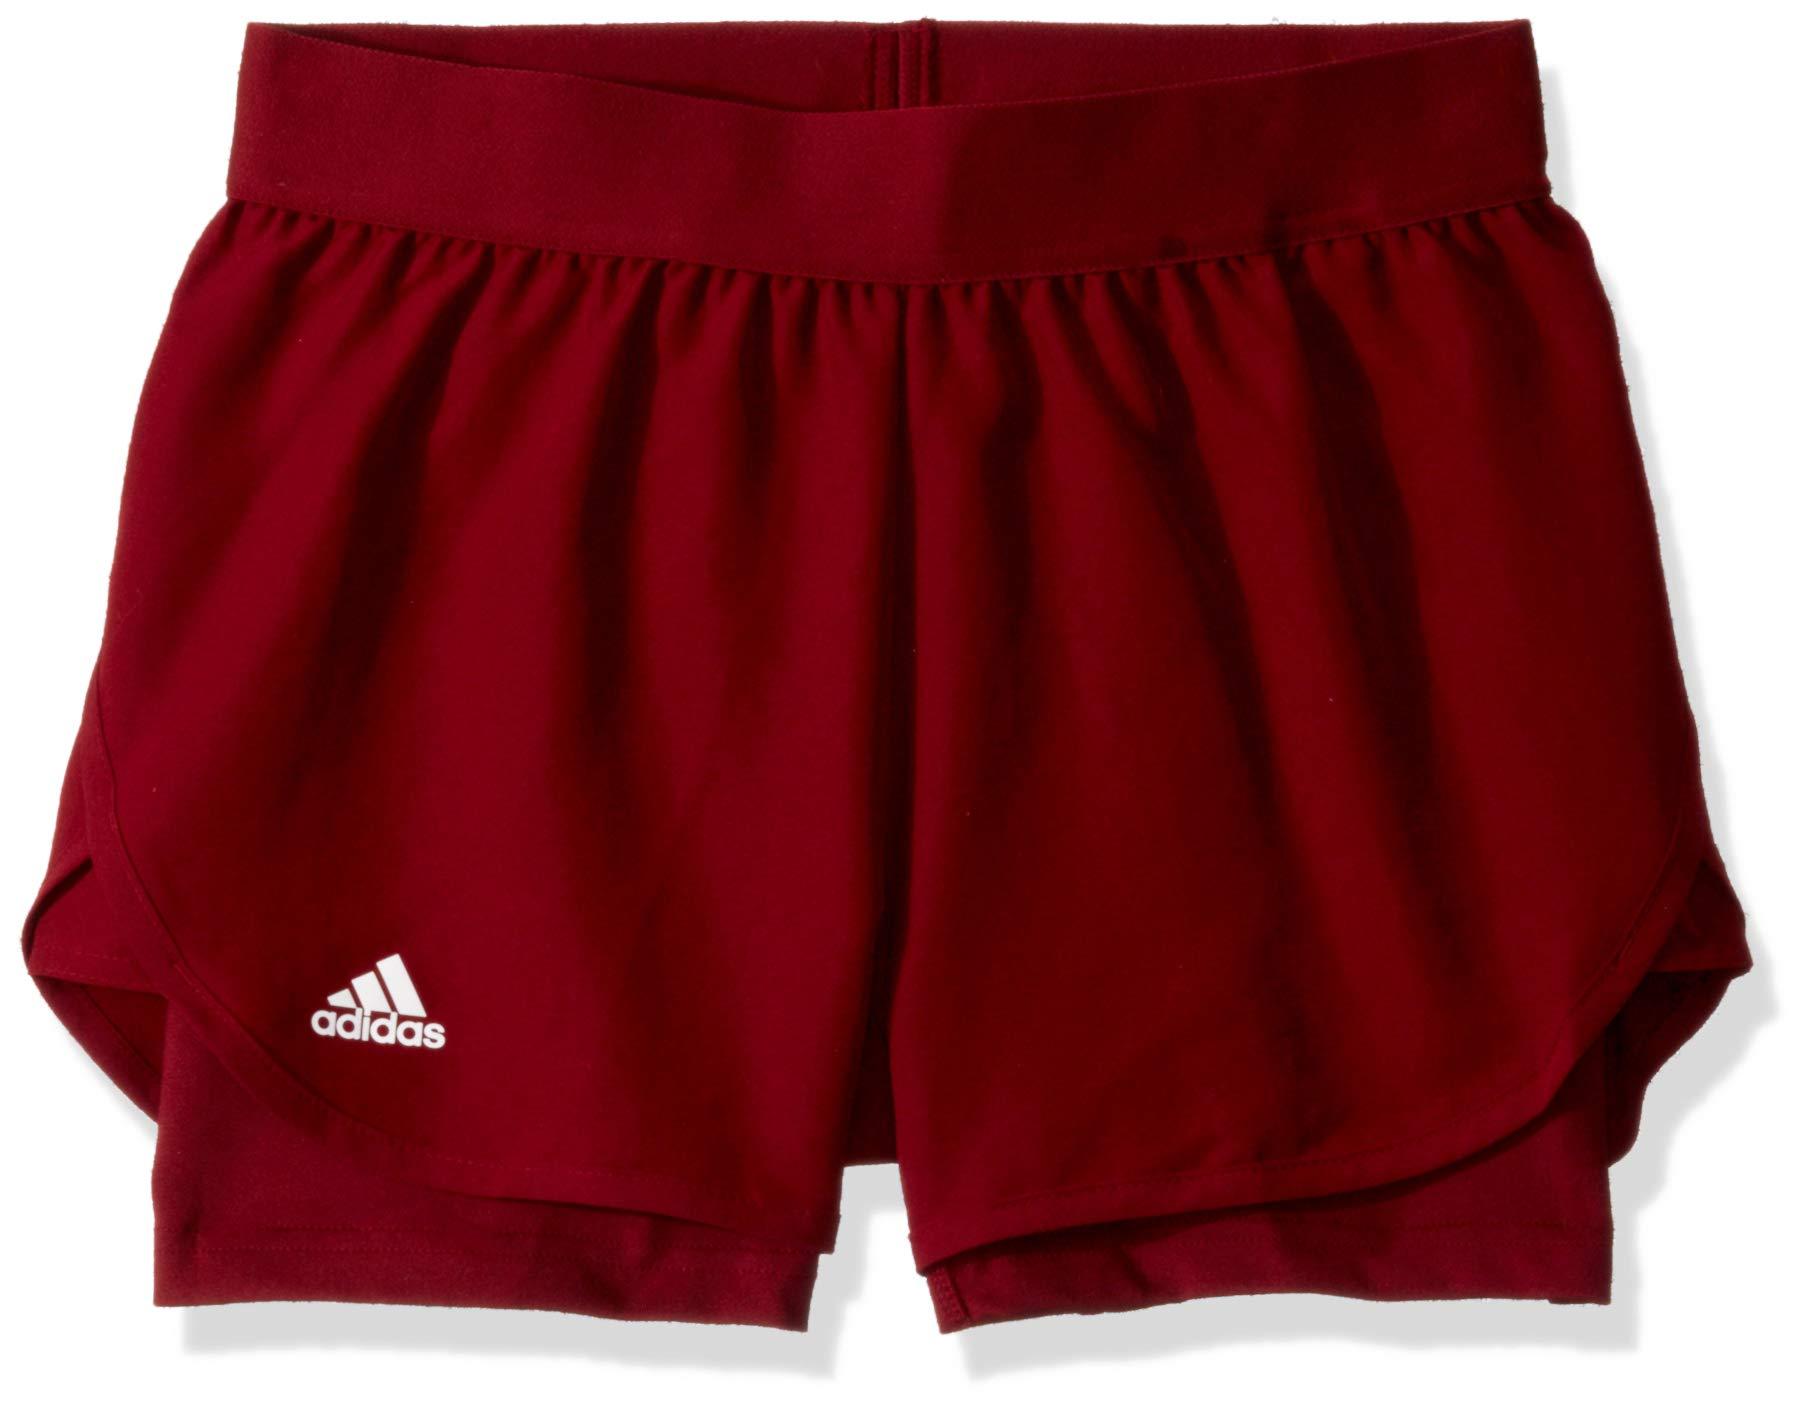 adidas Junior Girls' Club Tennis Shorts, Collegiate Burgundy/Collegiate Burgundy, Large by adidas